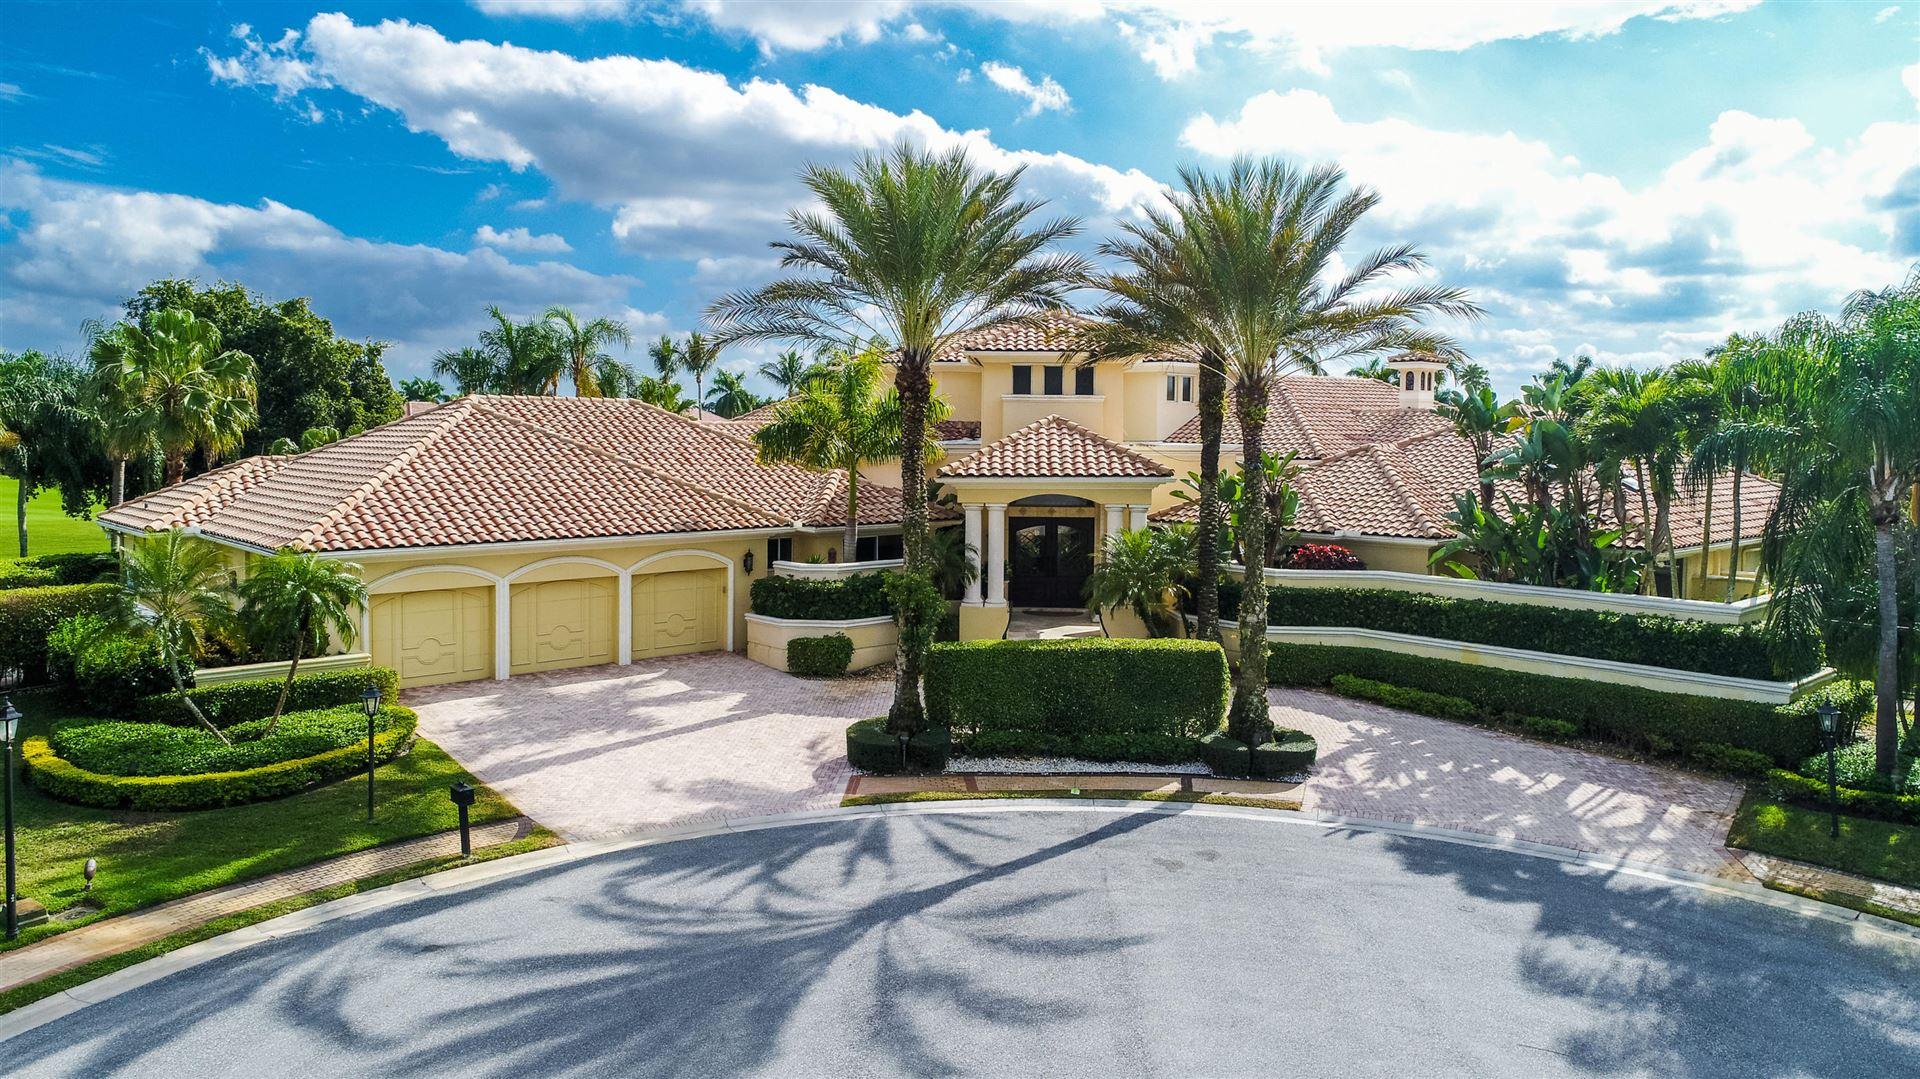 17153 Ericarose Court, Boca Raton, FL 33496 - #: RX-10599091